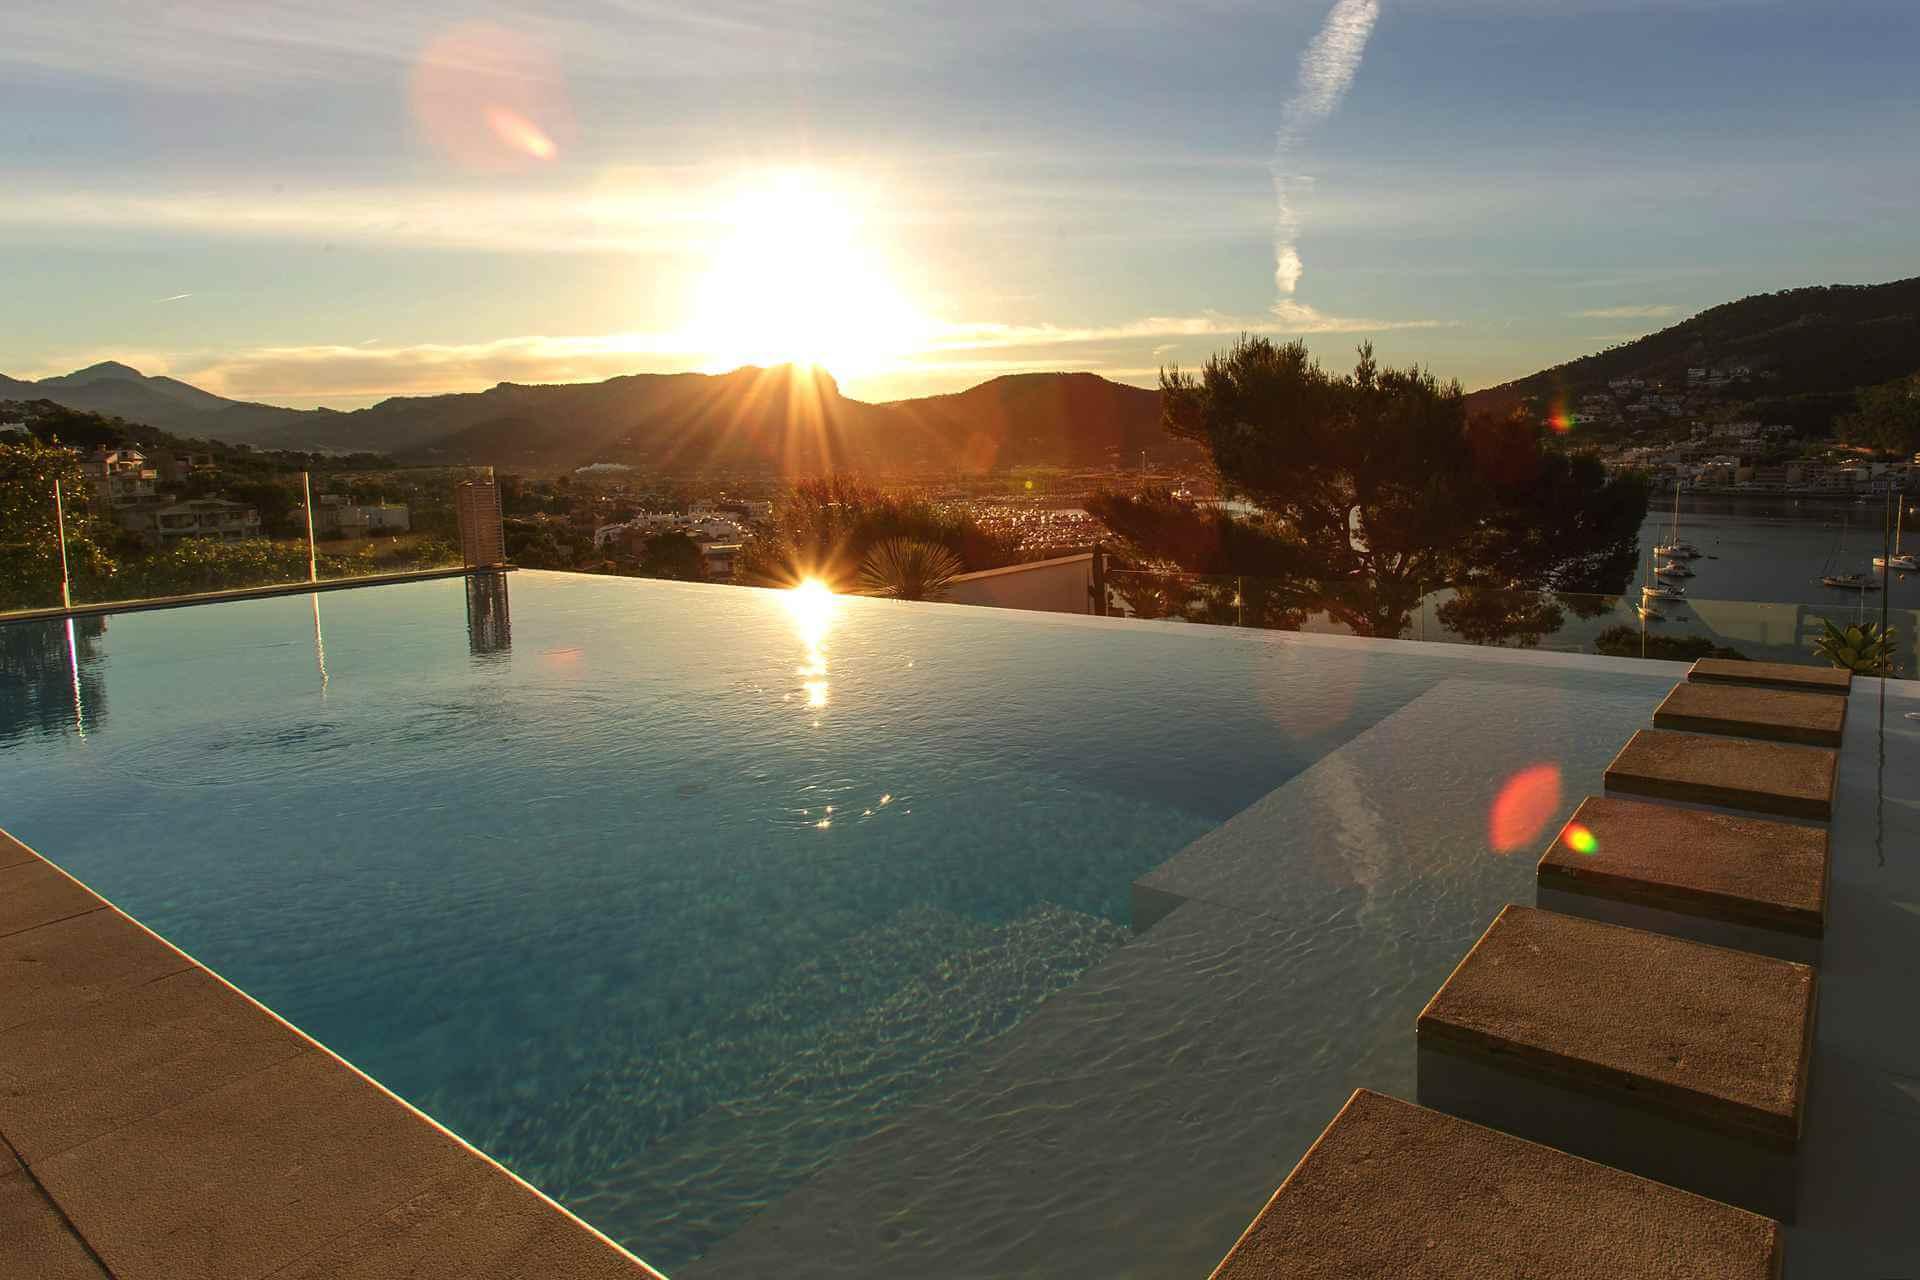 01-353 Villa with indoor pool Mallorca Southwest Bild 27